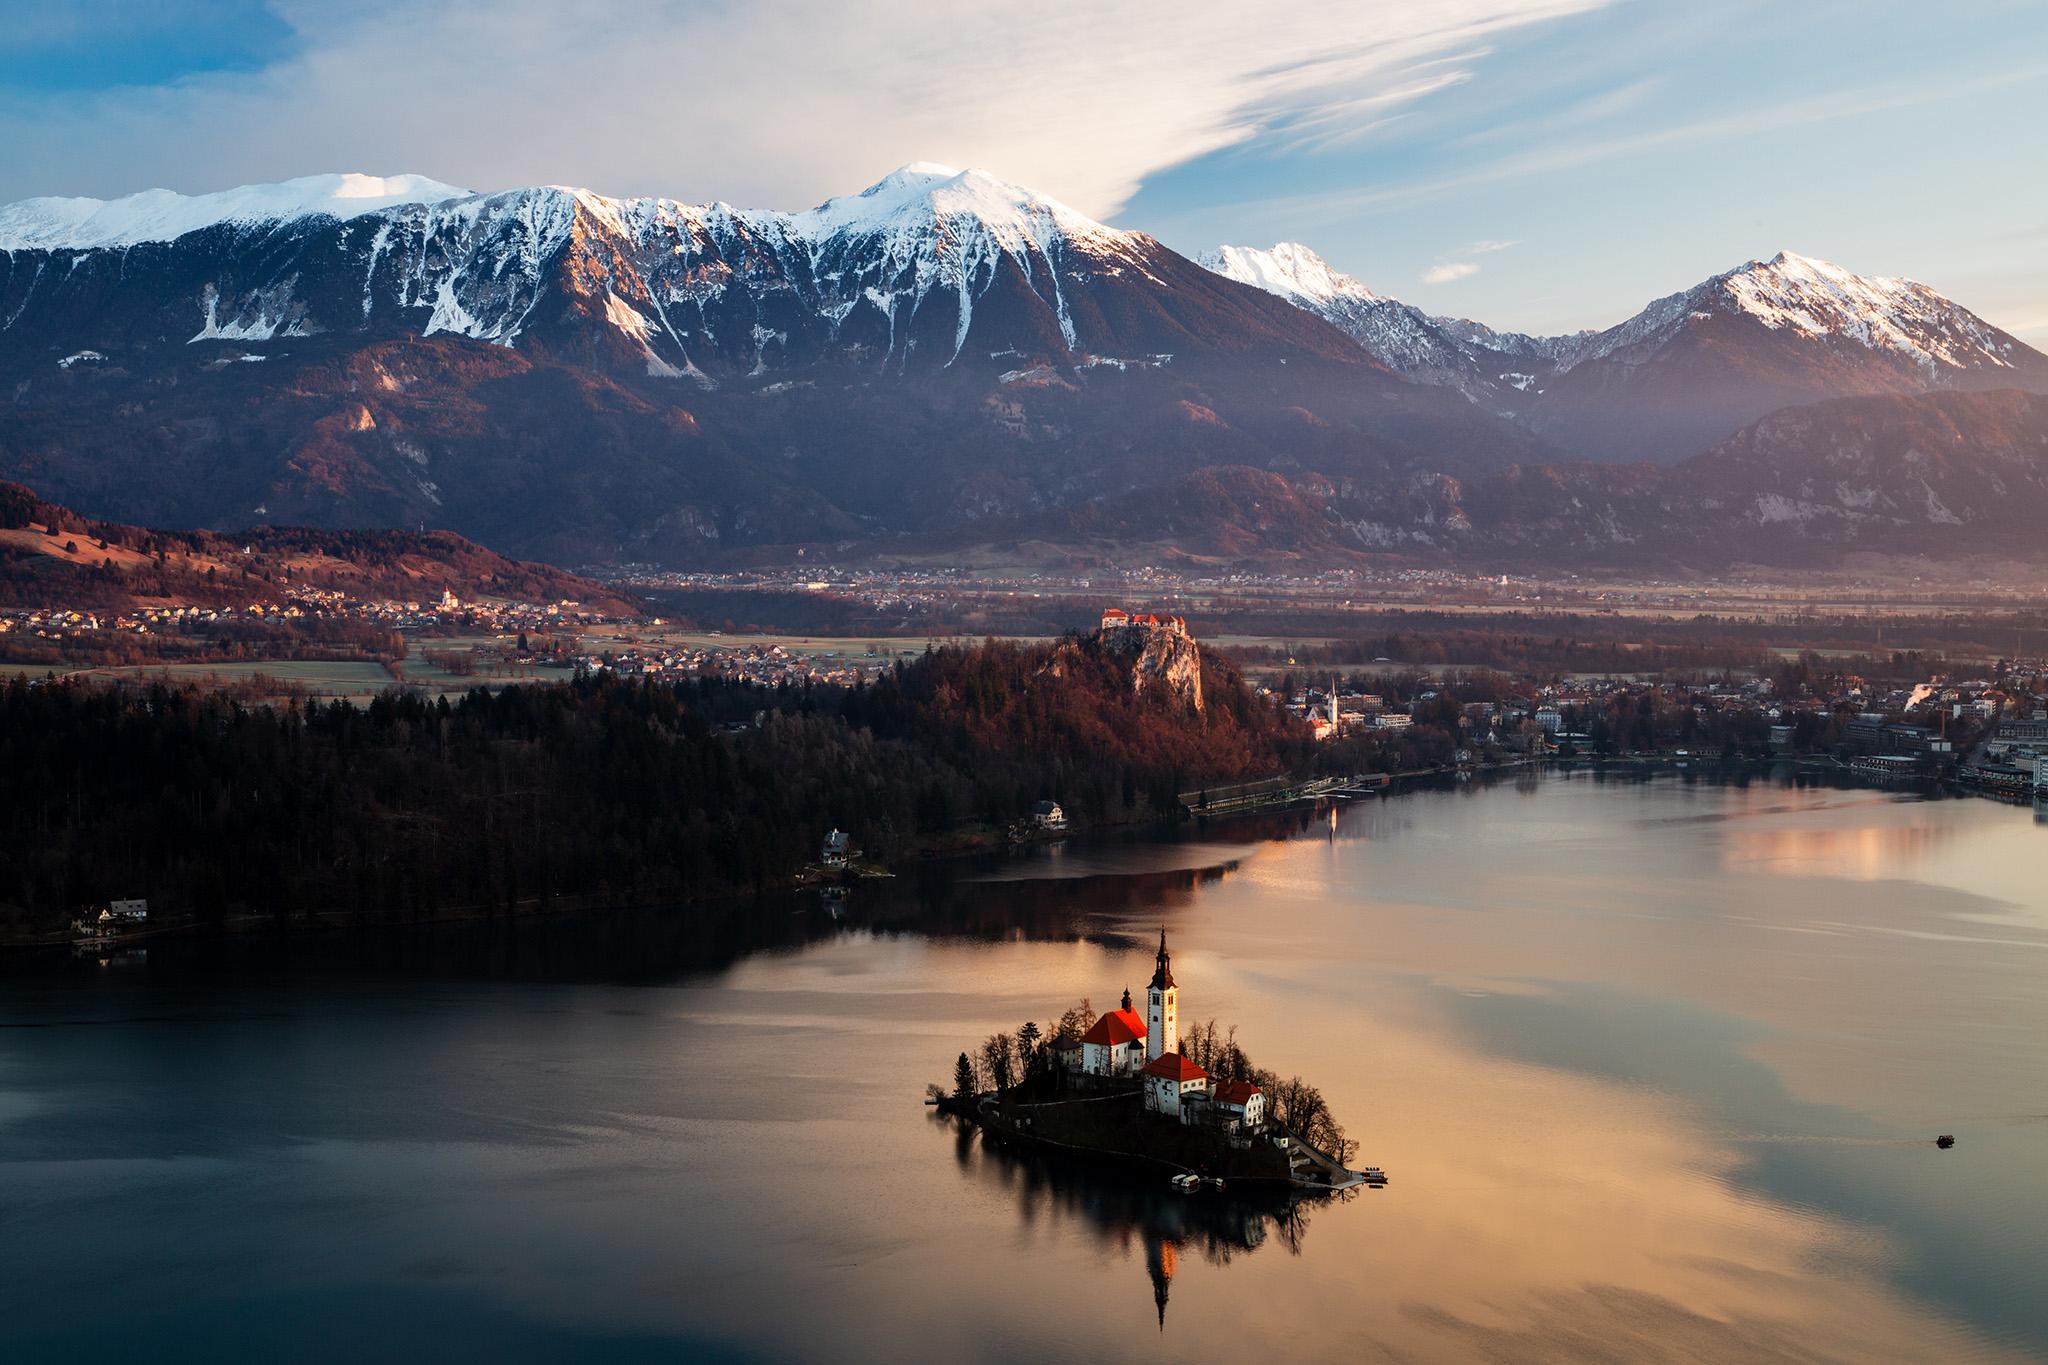 Lake Bled from Mala Osojnica